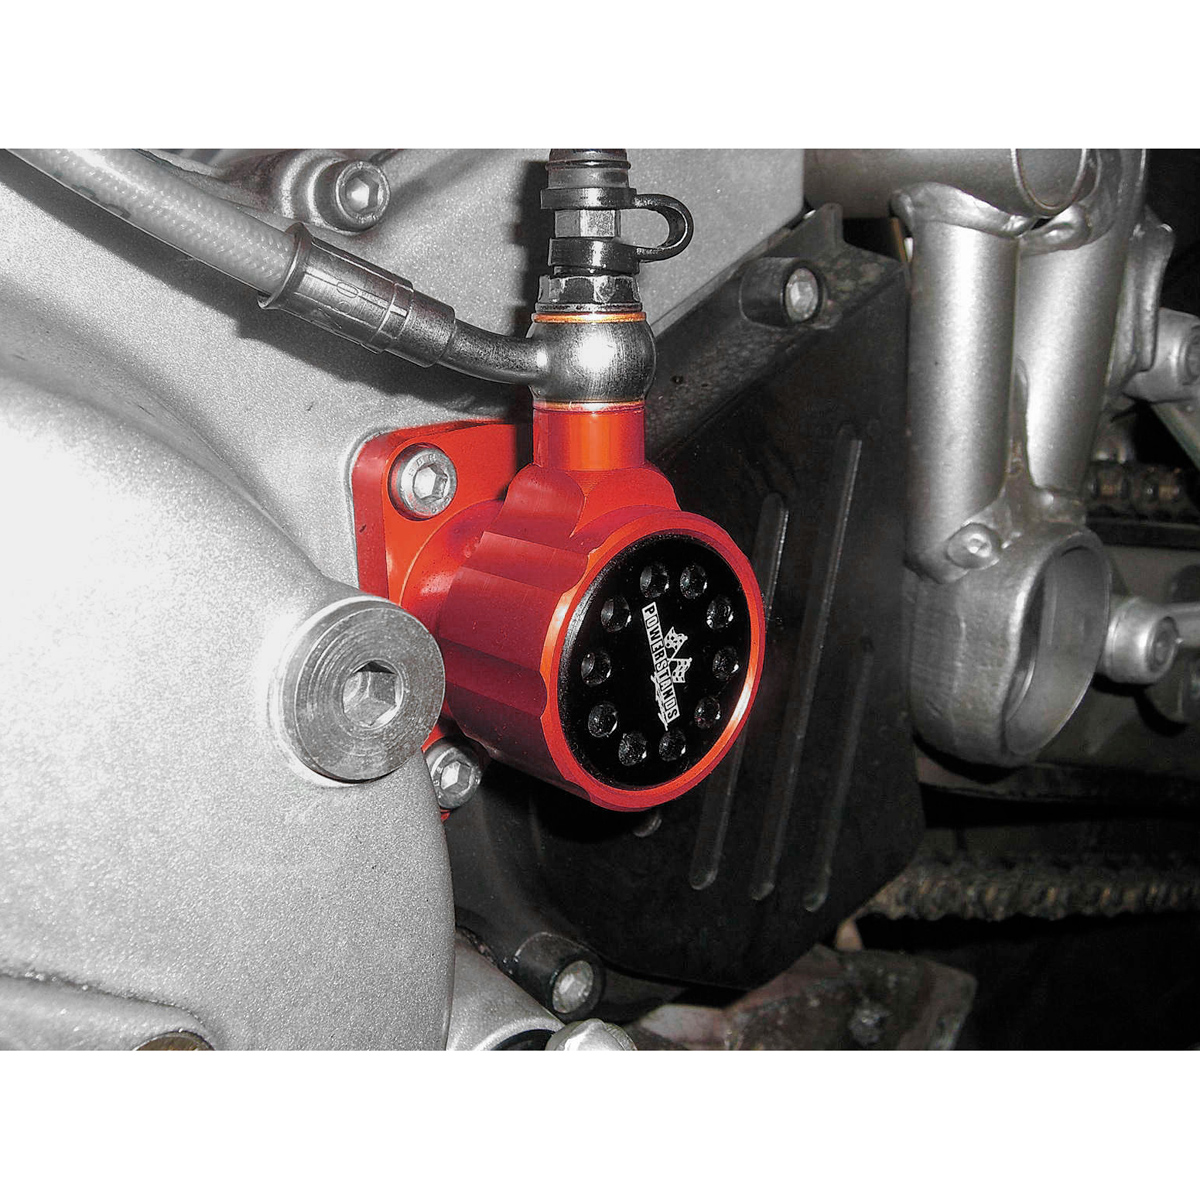 PSR-USA Hydraulic Clutch Slave Master Cylinder Red